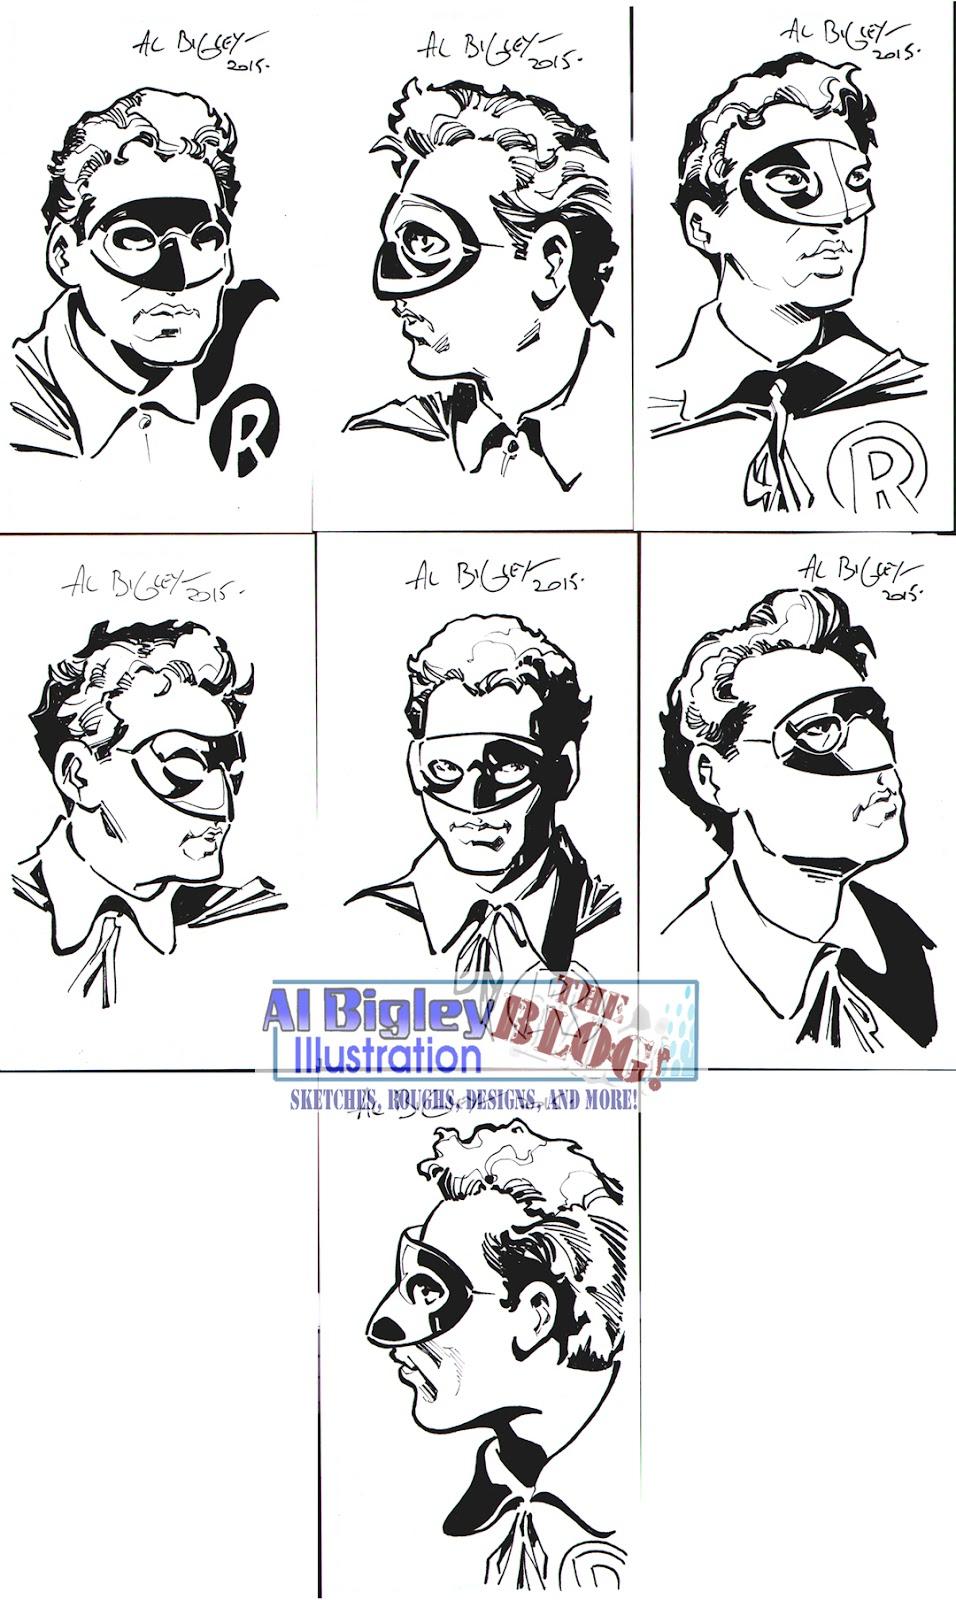 Al Bigley Illustration-The Blog!: 1940s Robin Commissioned